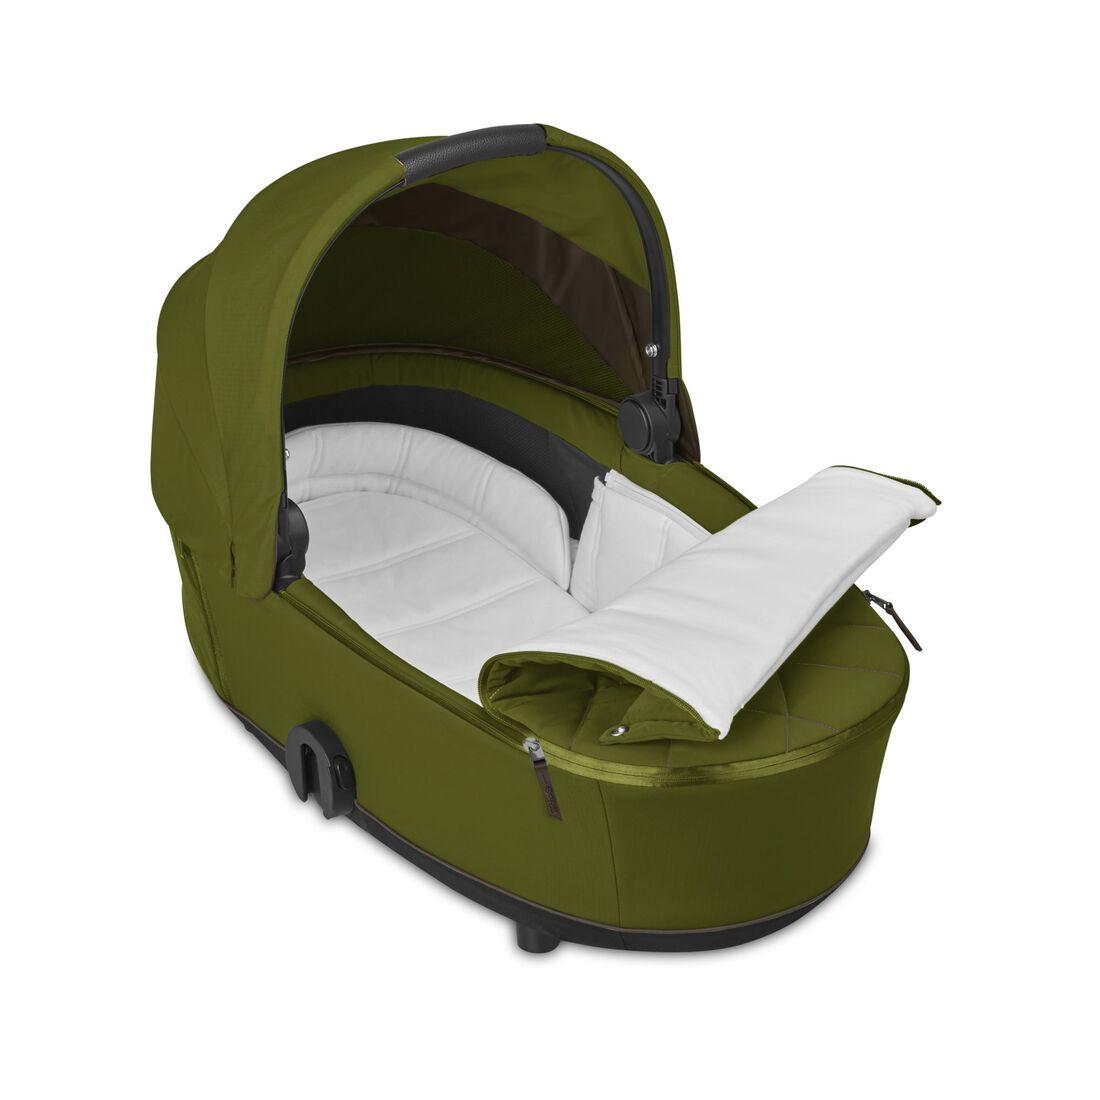 CYBEX Mios Lux Carry Cot - Khaki Green in Khaki Green large Bild 2